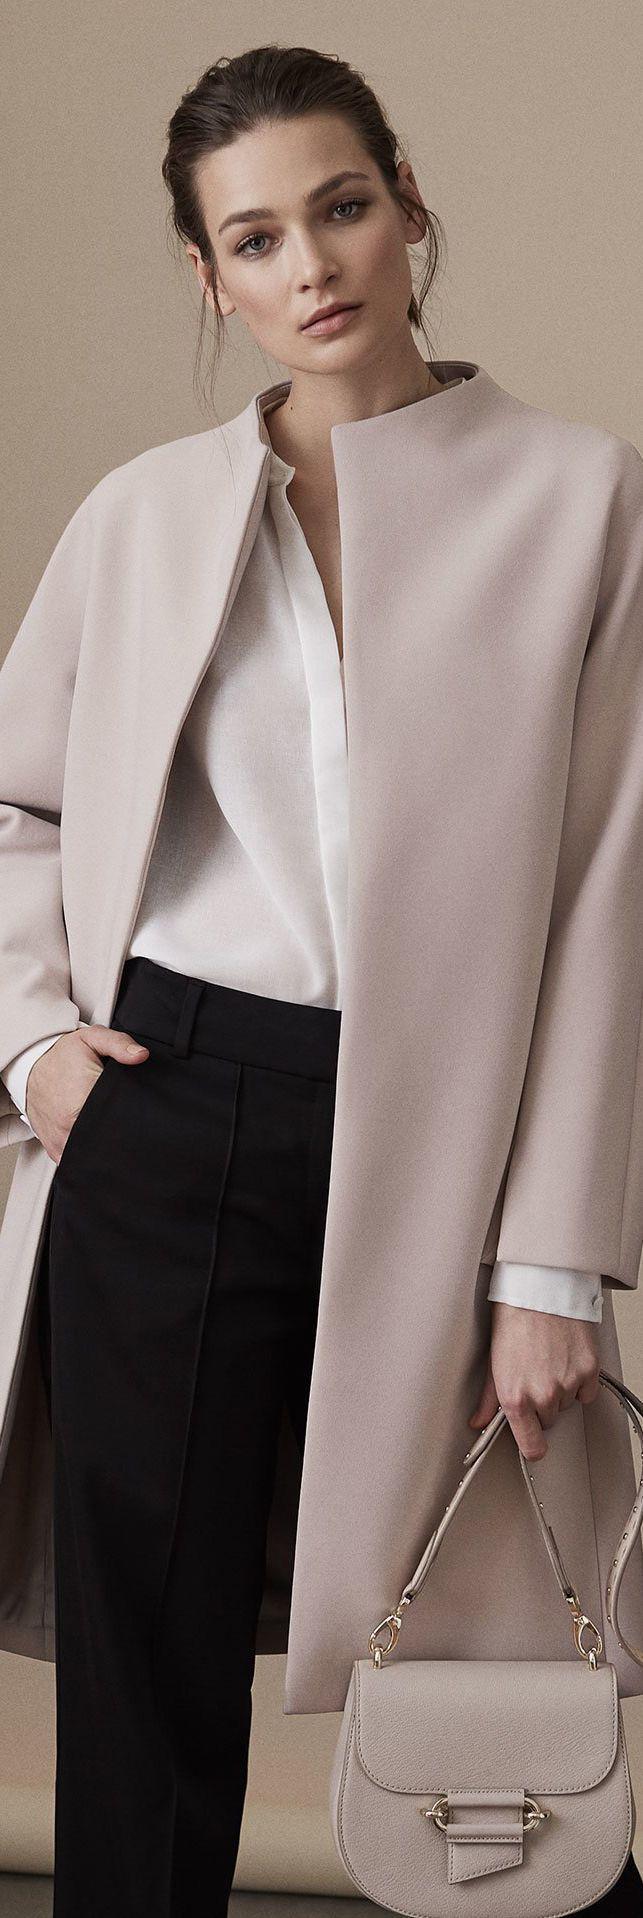 Office fashion women 2018 82